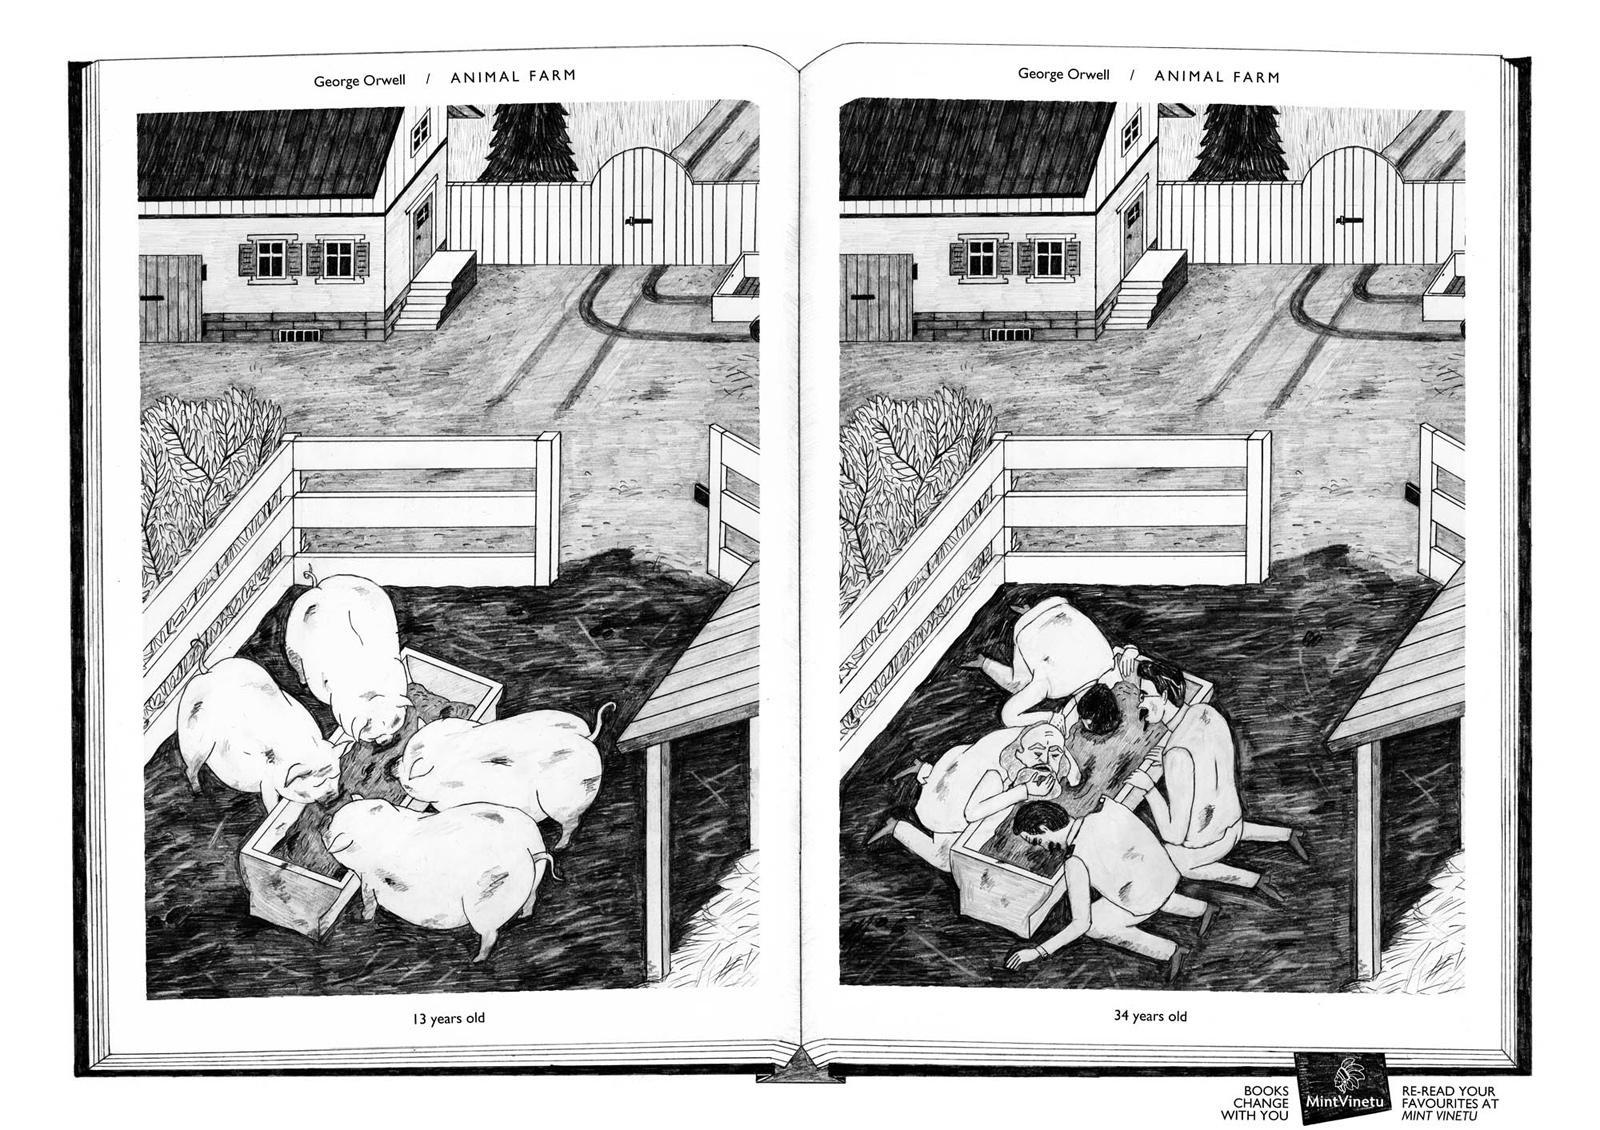 Mint Vinetu Print Ad -  Books Change With You, Animal Farm